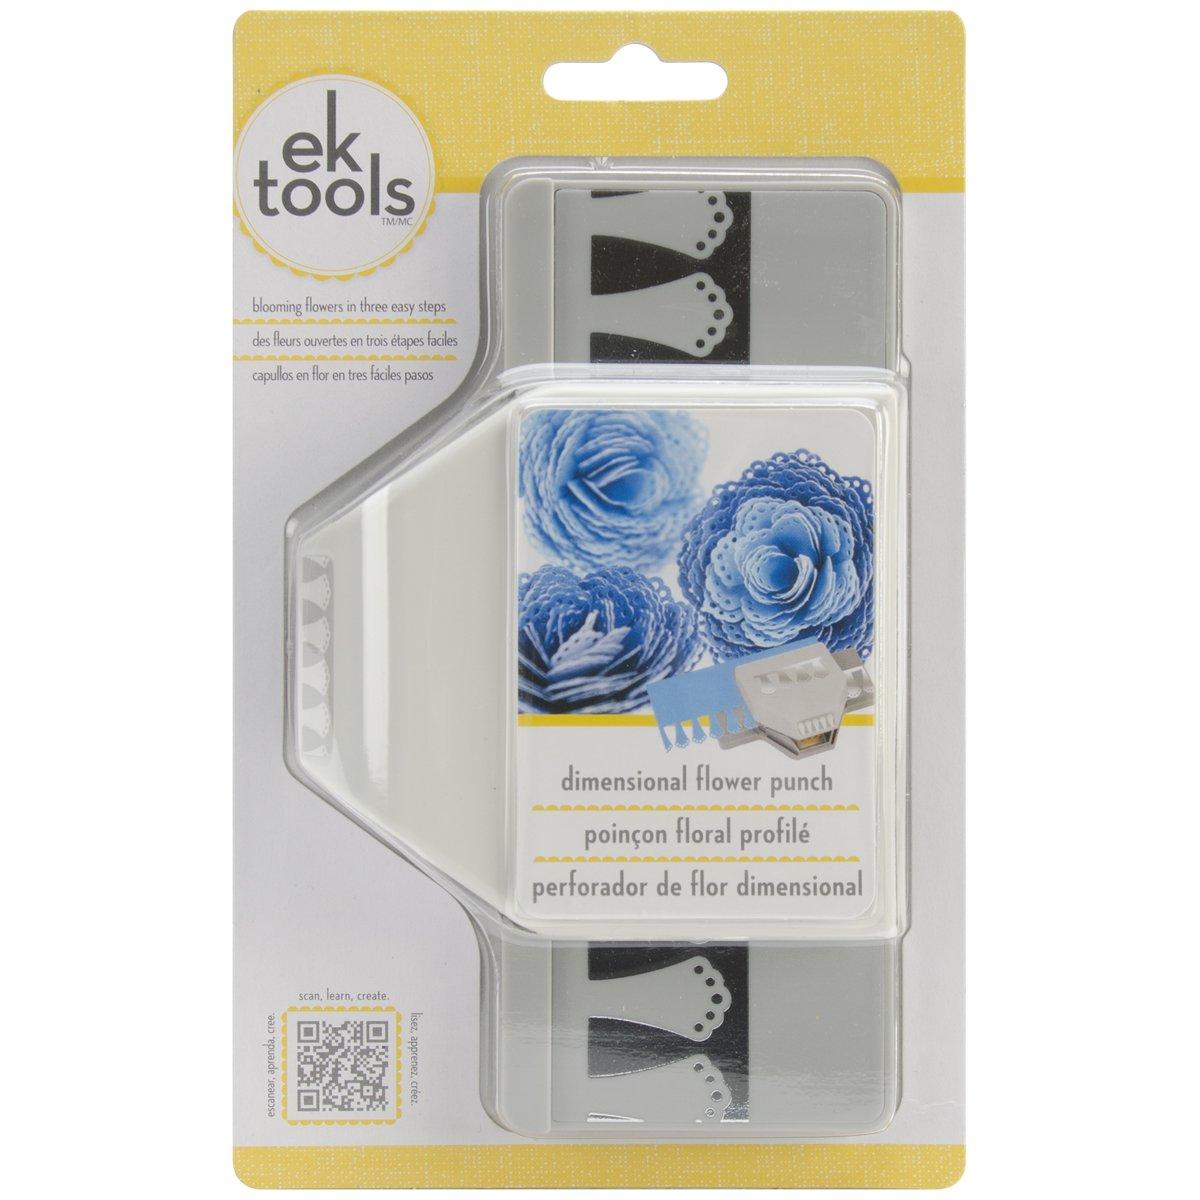 Doily Petals Large EK Success 54-51009 54-51009 Tools Edge Punch